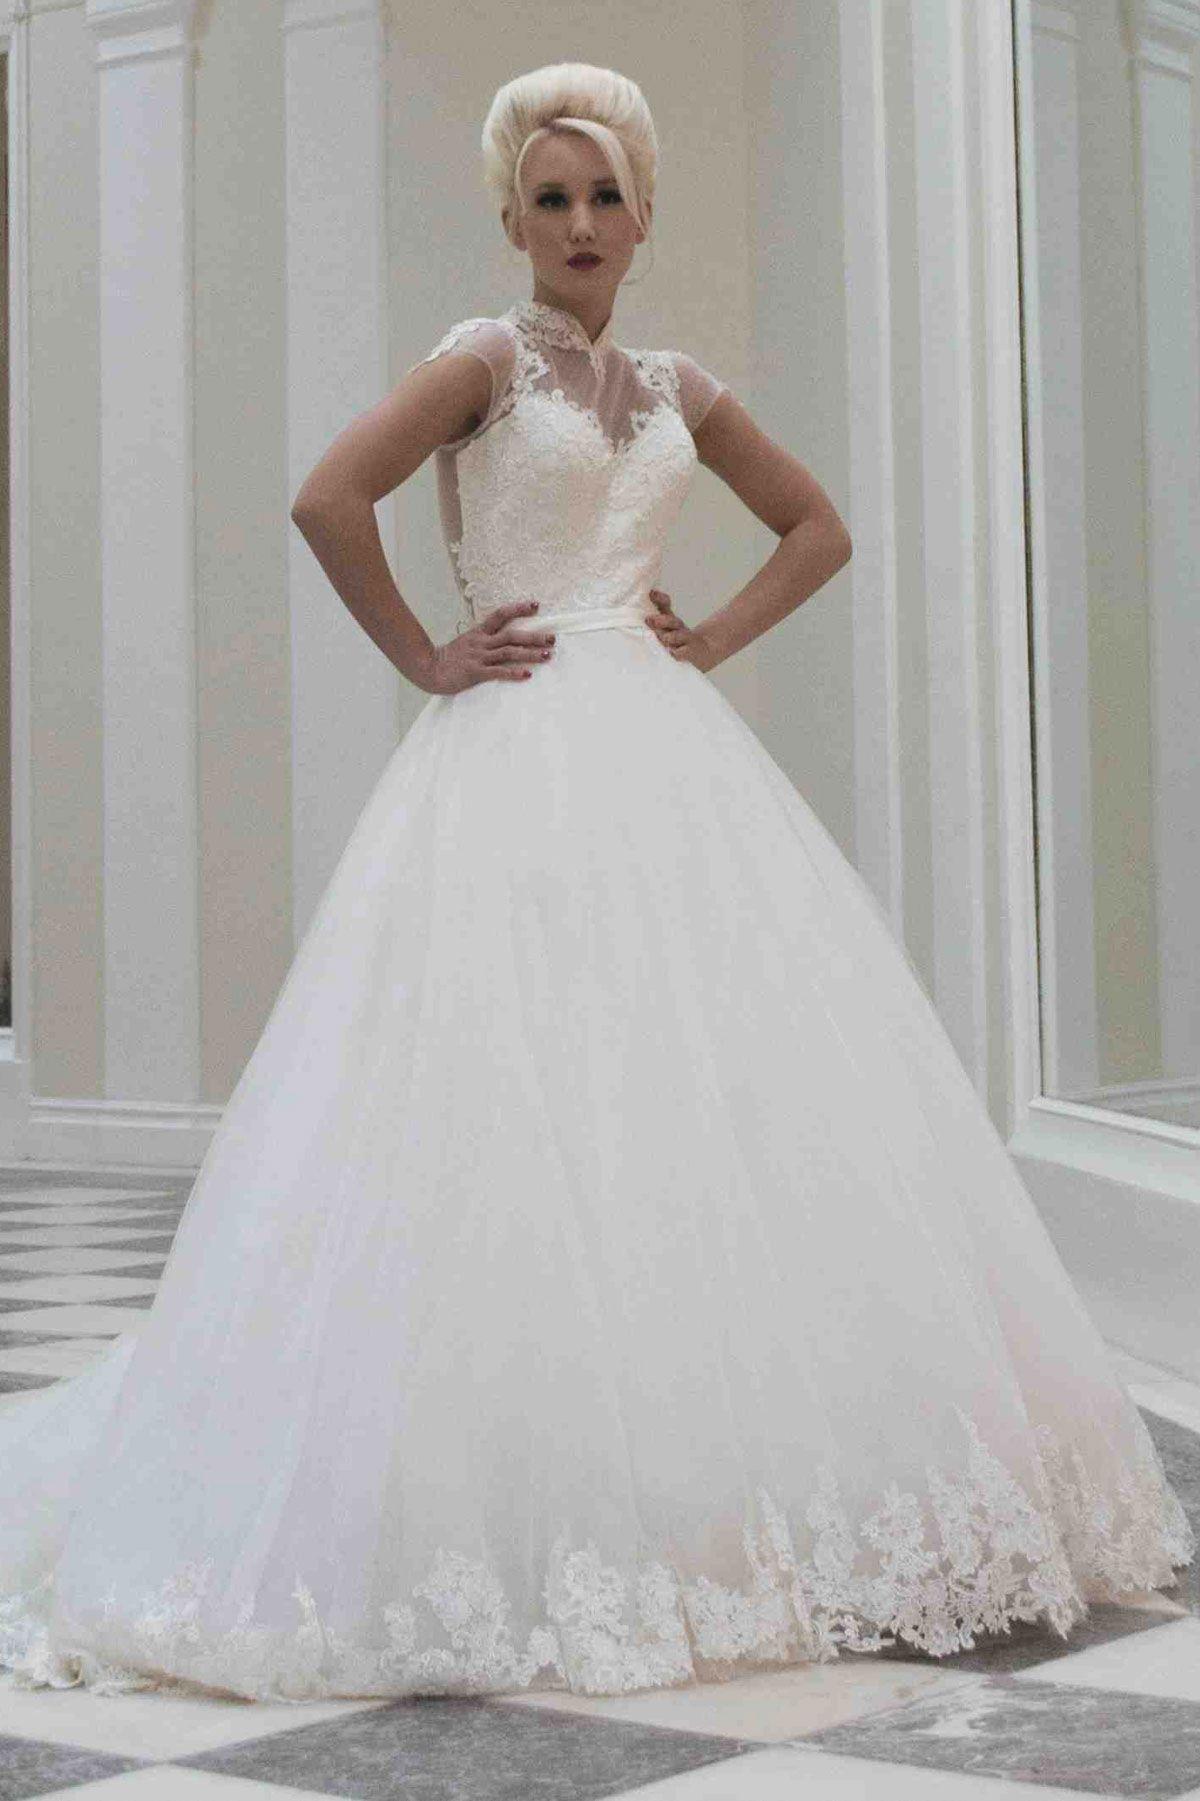 Ava by Mooshki   Wedding Dresses   www.guidesforbrides.co.uk